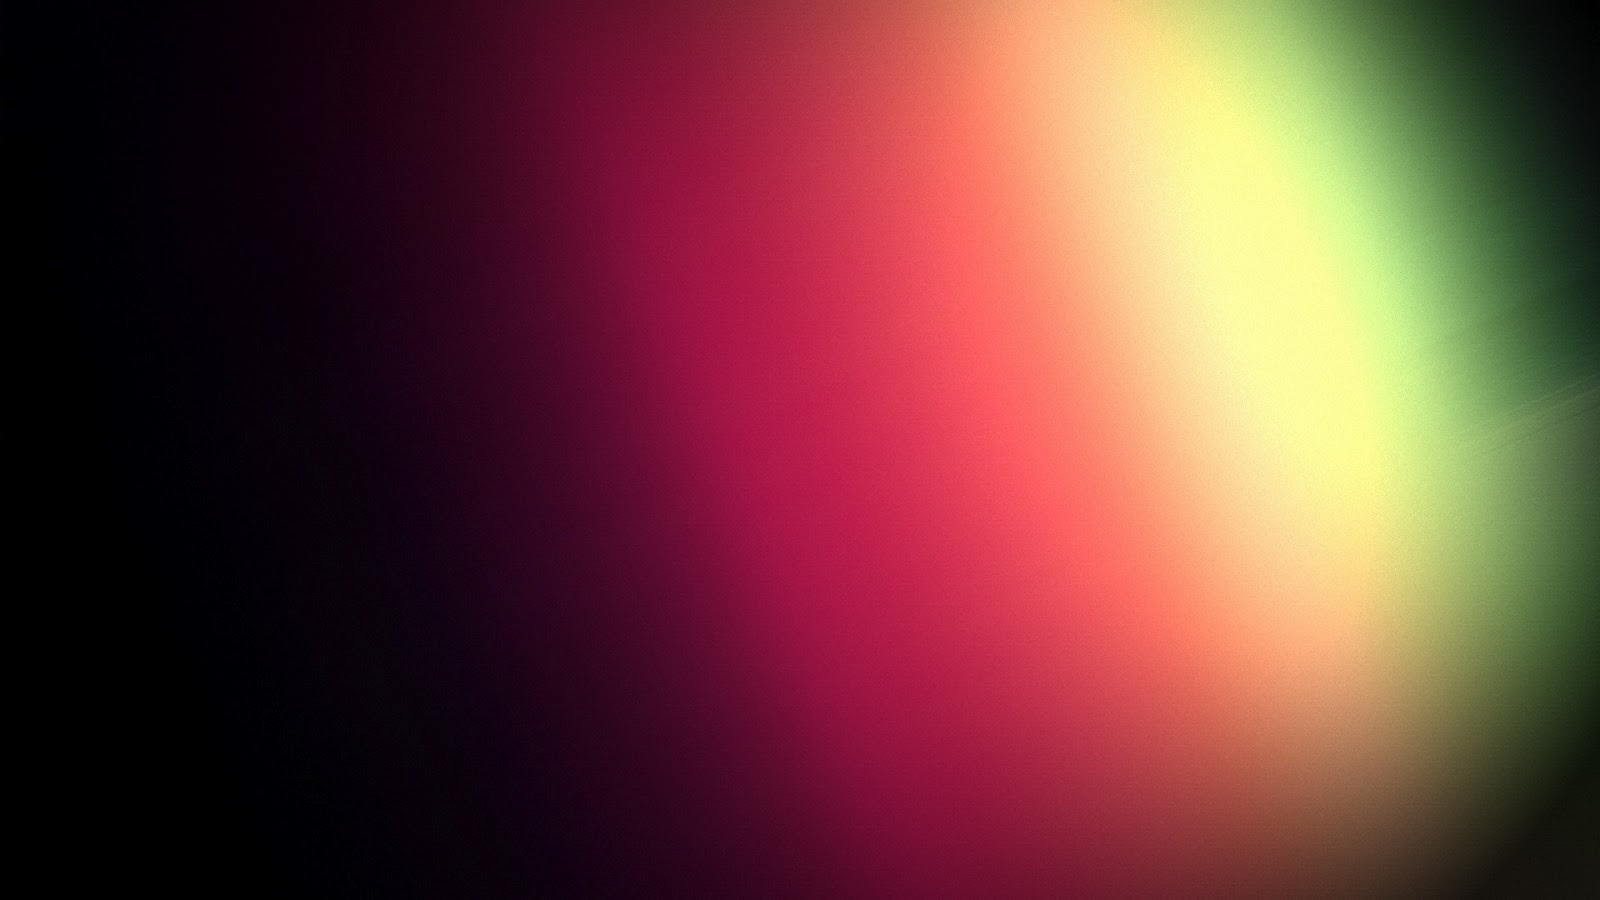 Spectrum Abstract HD Wallpaper 1080p   HD Dock 1600x900